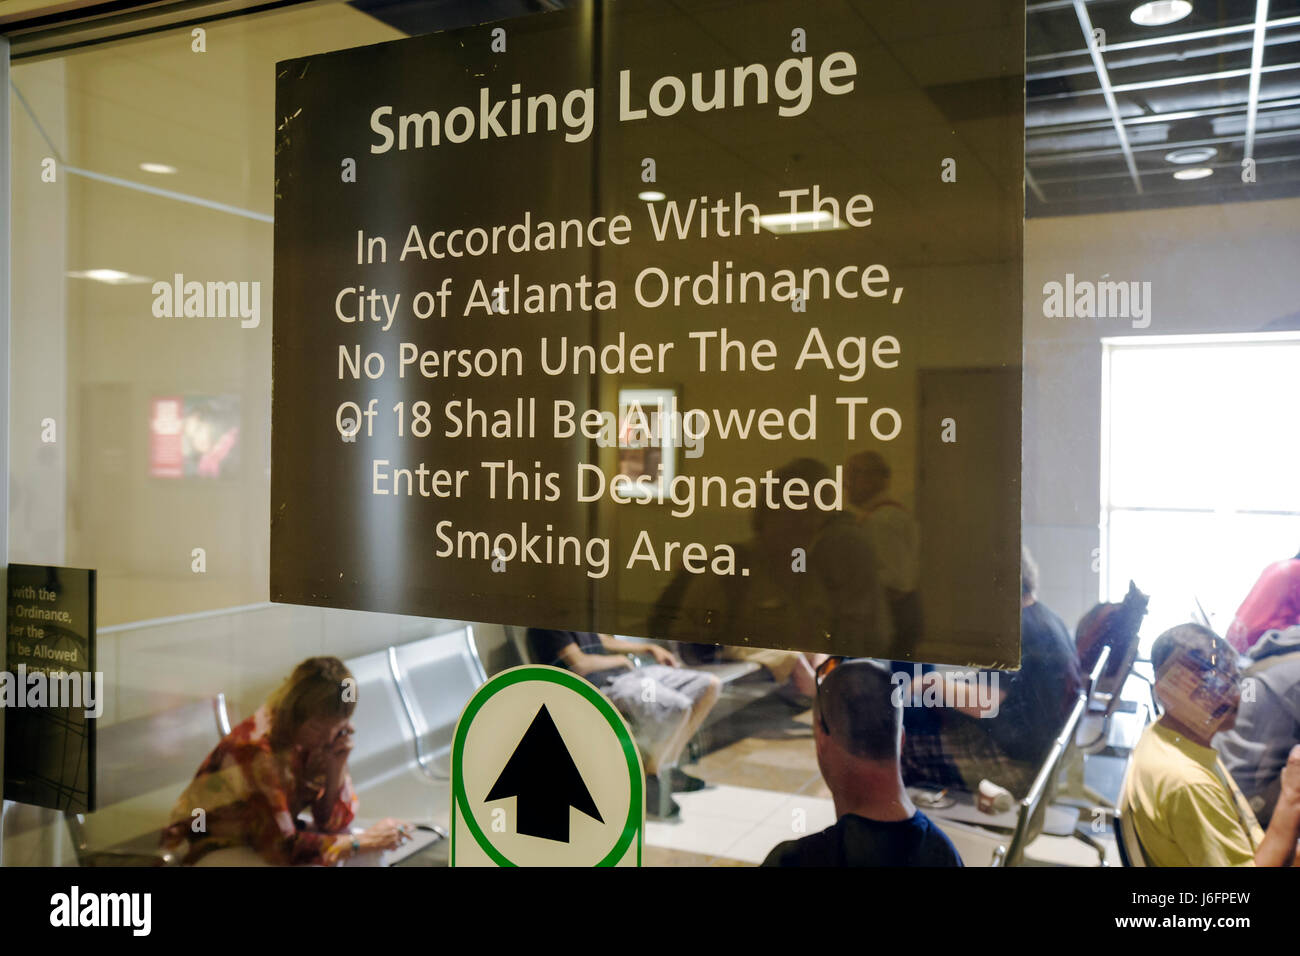 Atlanta Georgia Hartsfield-Jackson Atlanta International Airport smoking lounge vice addiction restriction warning - Stock Image